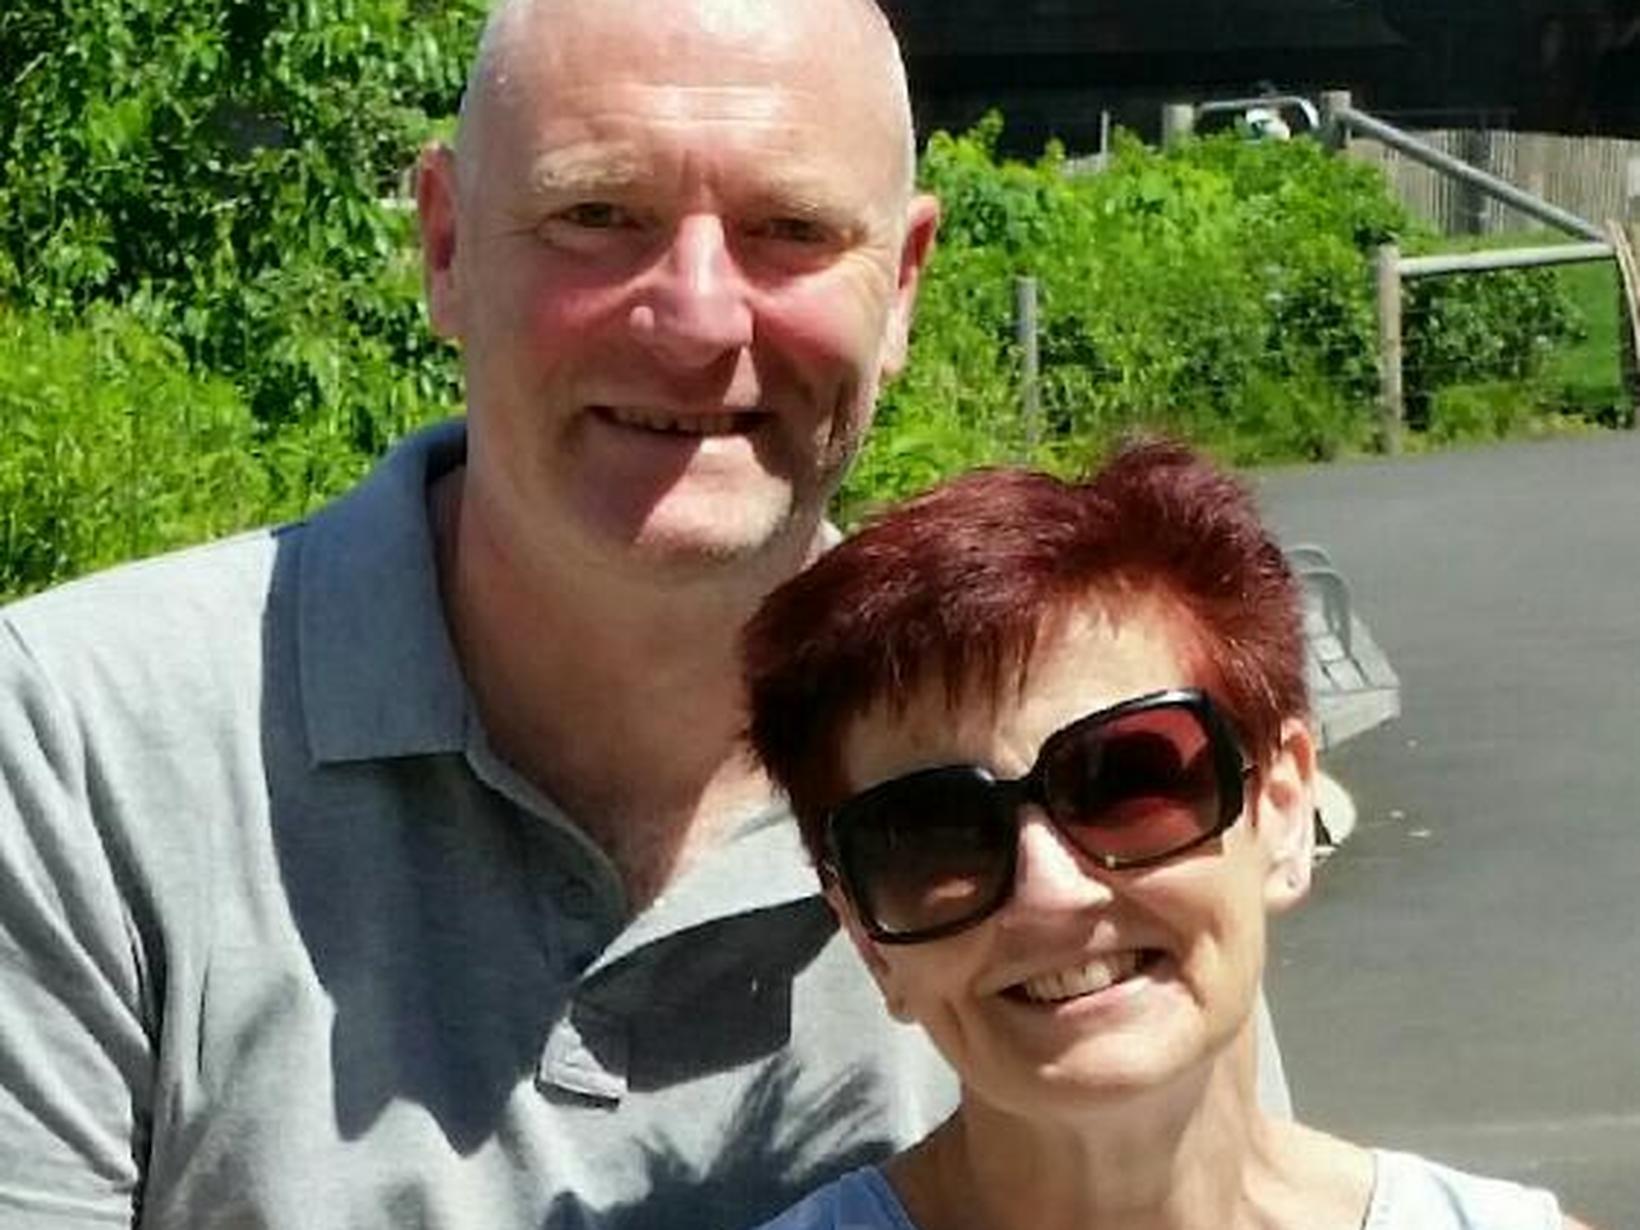 Marian & David from Perth, Western Australia, Australia